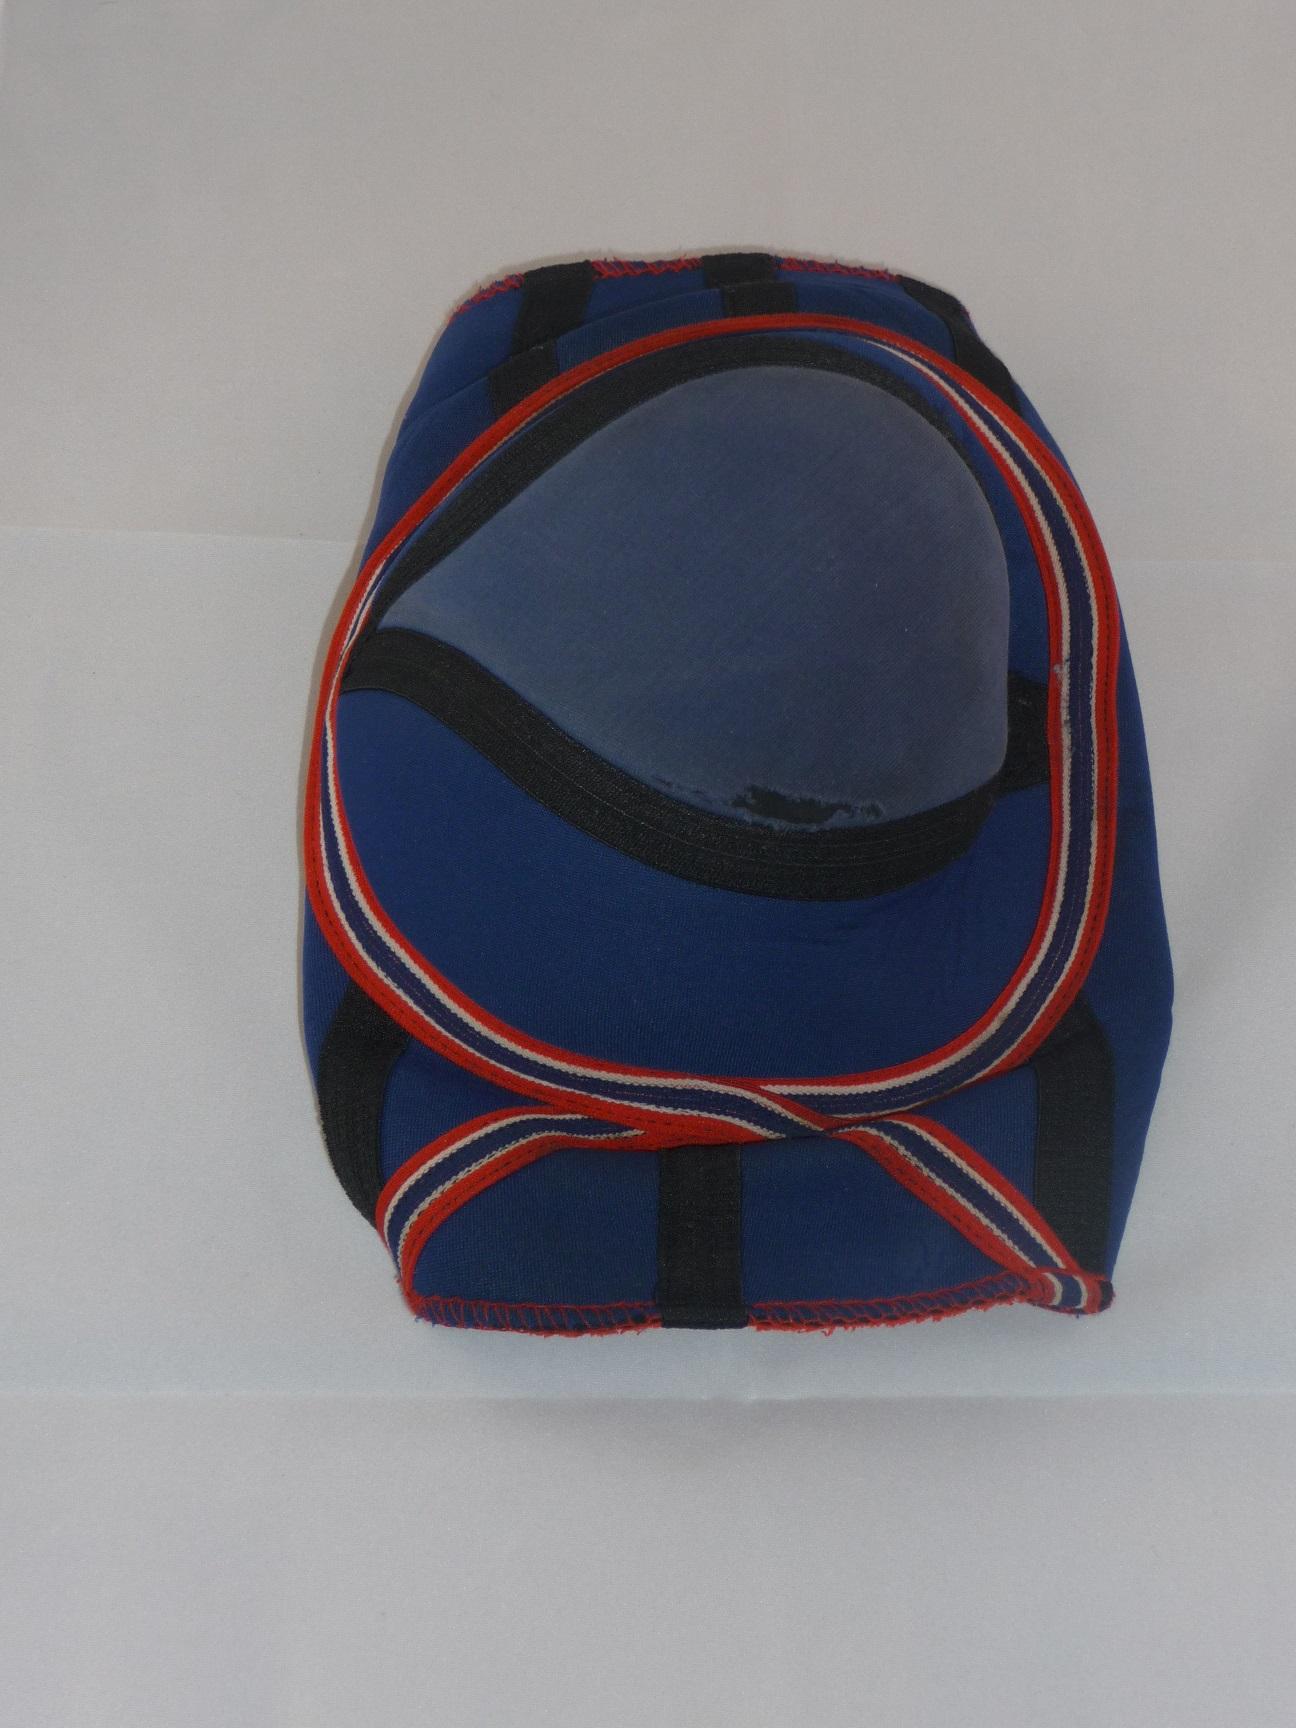 Schutzausrüstung Knieschützer Neopren Knieprotektoren Knieschoner Knieschutz Kniepolster NEU Inlineskating